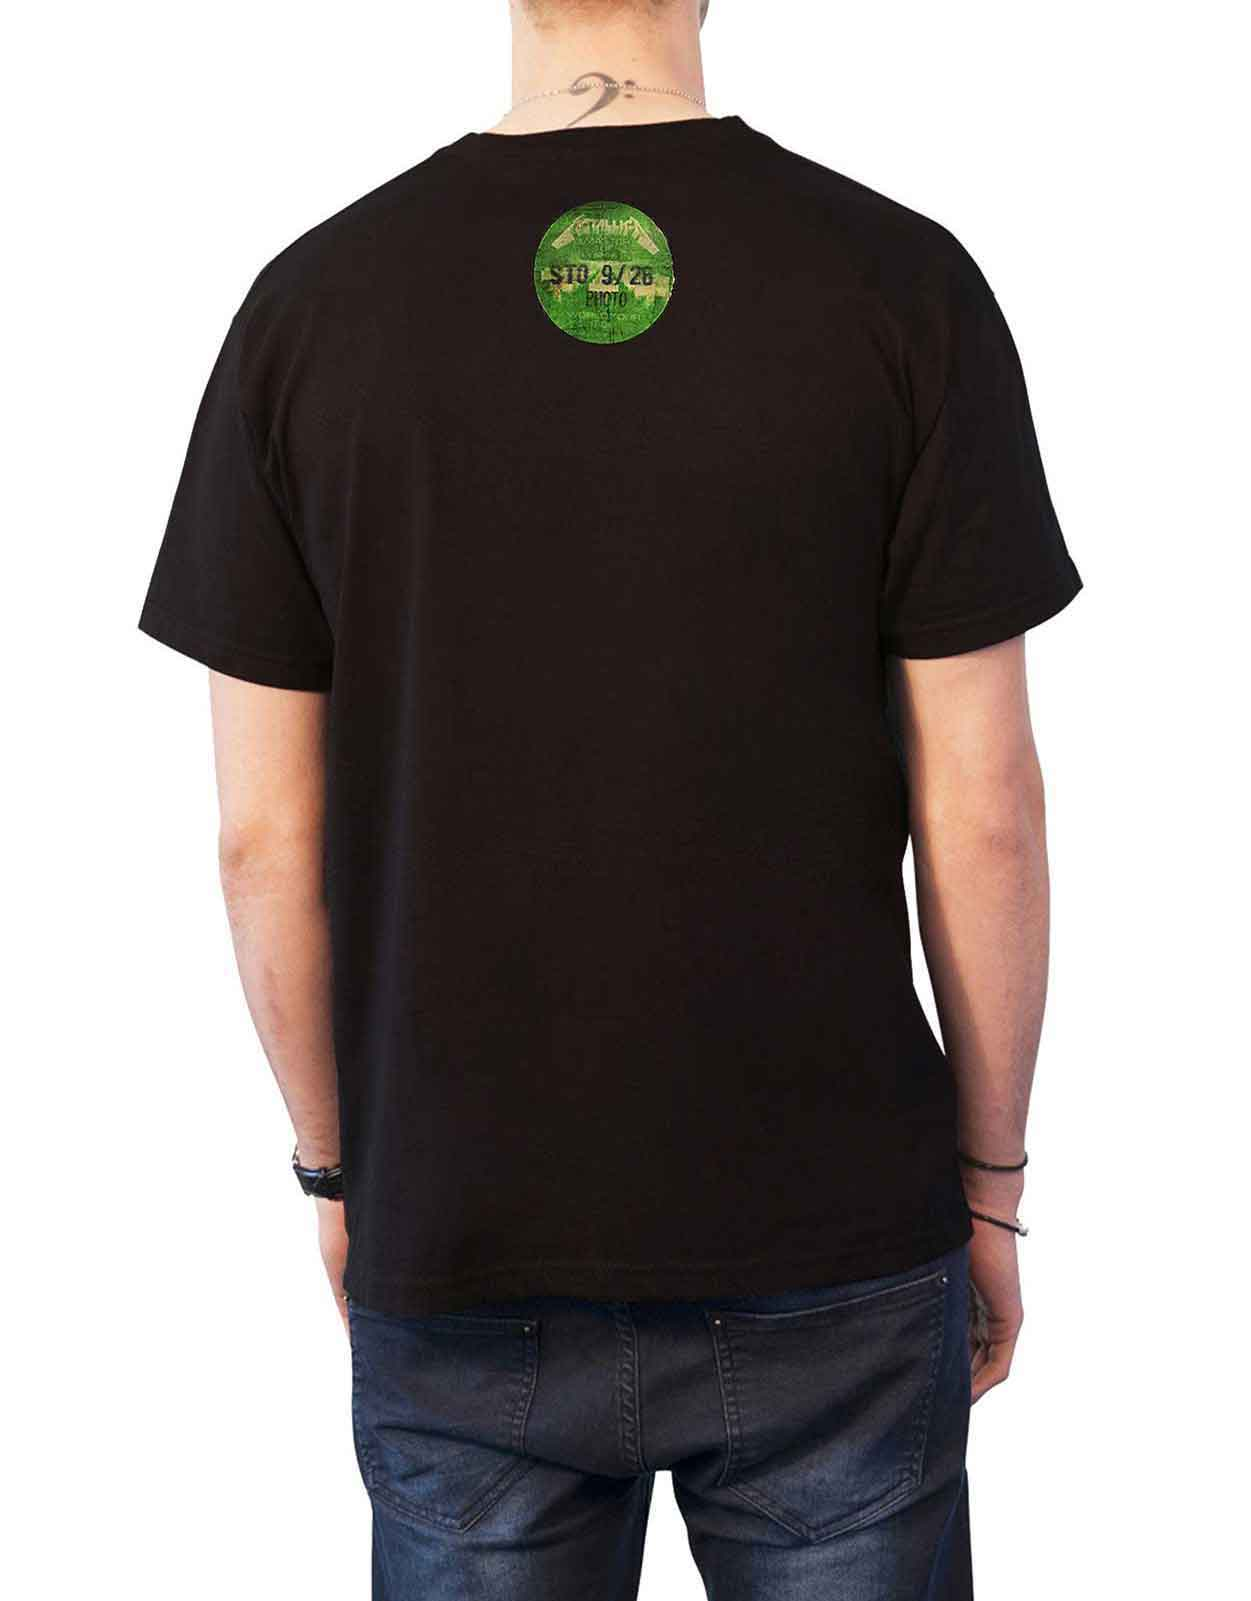 Officiel-Metallica-T-shirt-filaire-justice-for-all-RTL-Band-Logo-Homme-Nouveau miniature 47